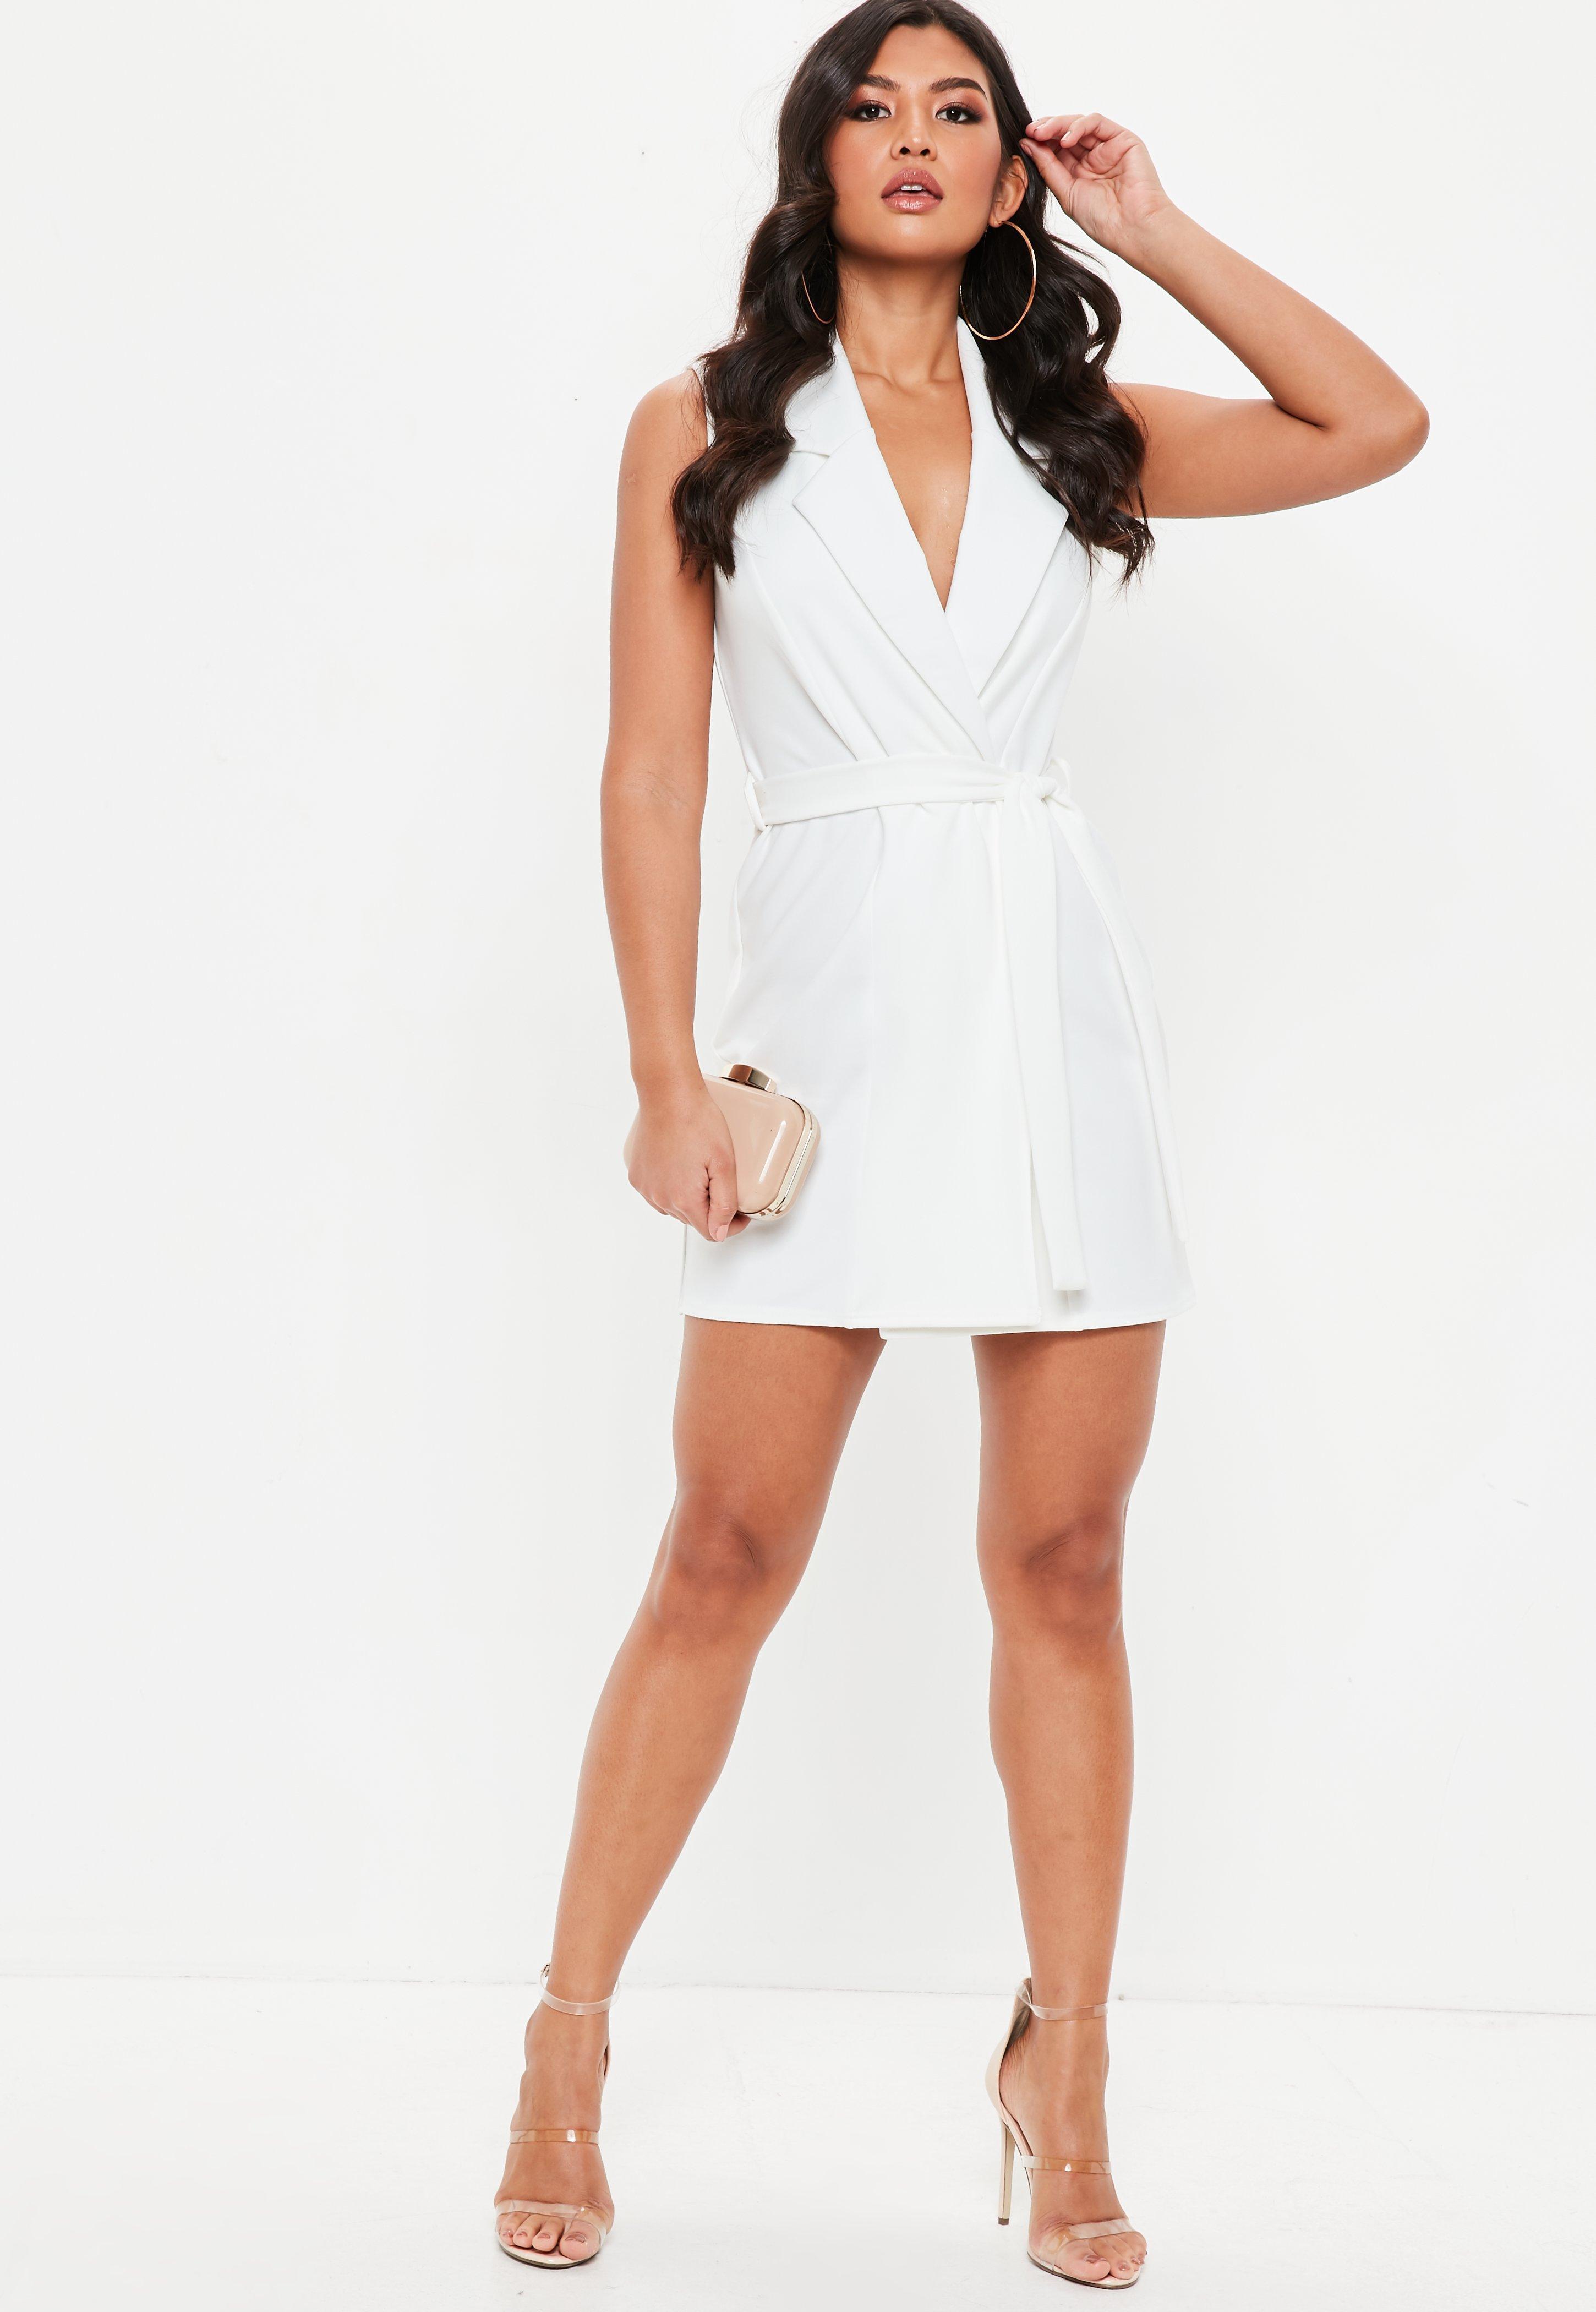 5cad173131f85 Missguided - White Sleeveless Stretch Crepe Blazer Dress - Lyst. View  fullscreen